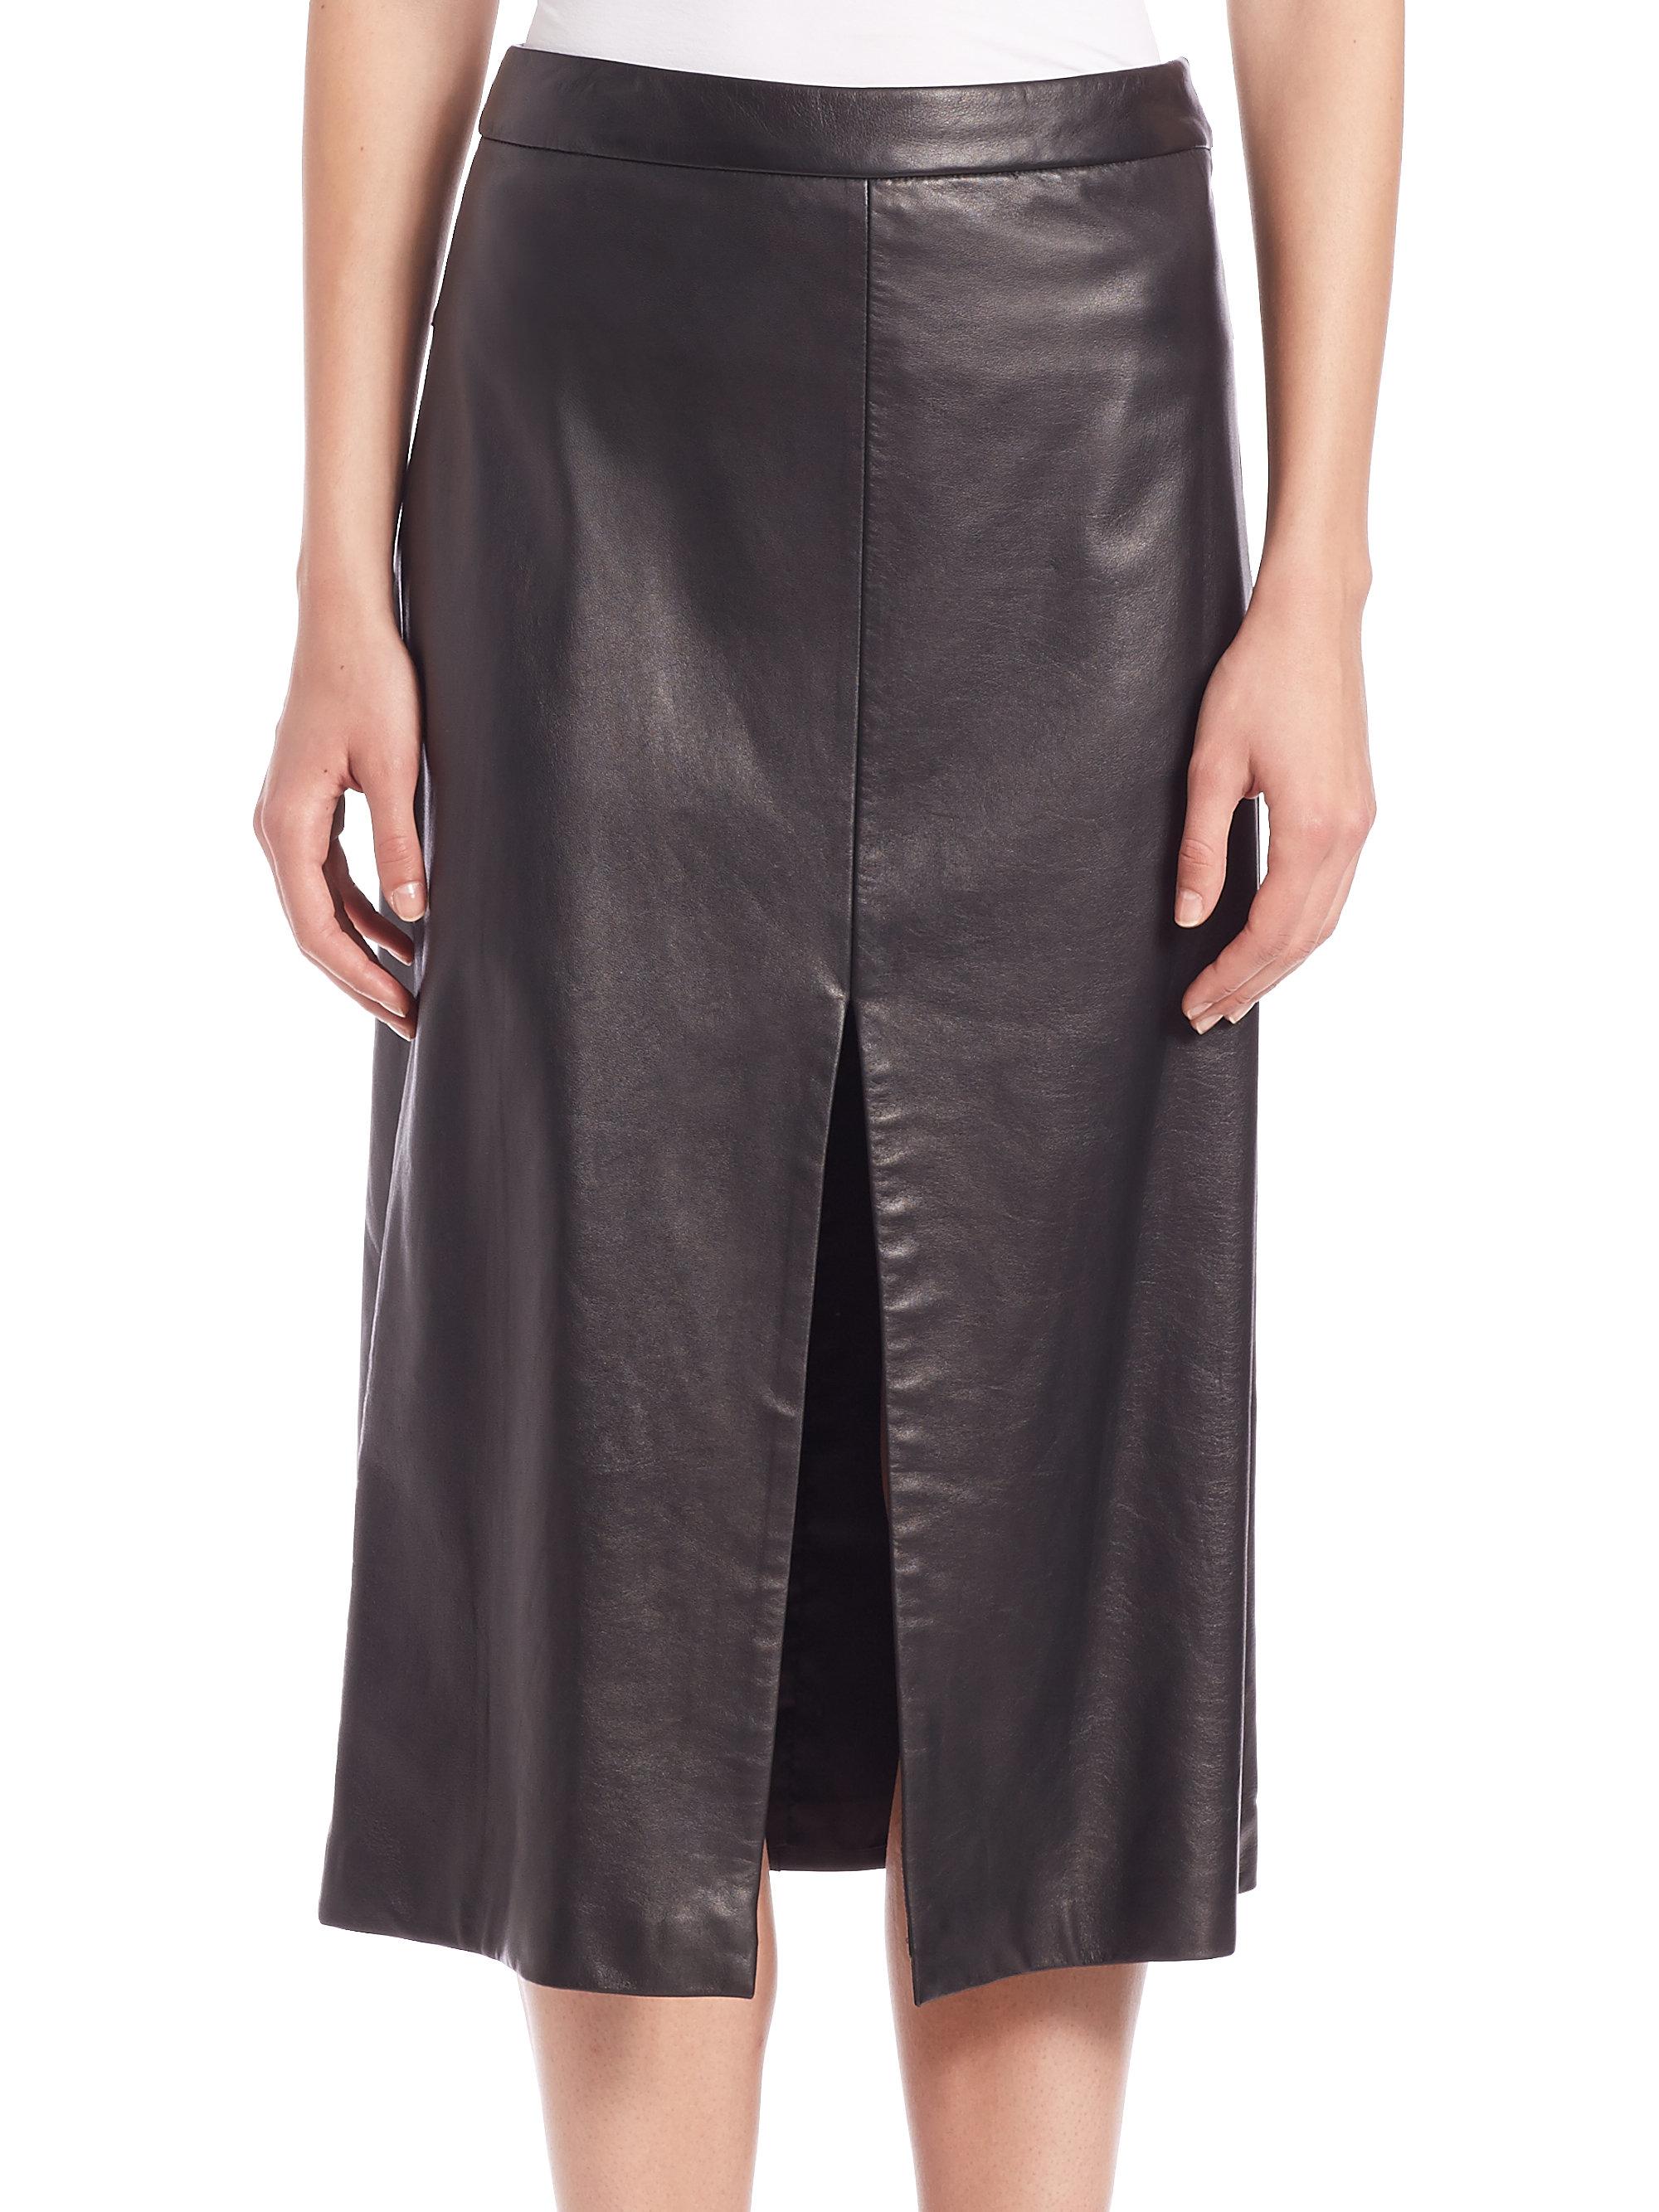 tess giberson leather slit skirt in black lyst